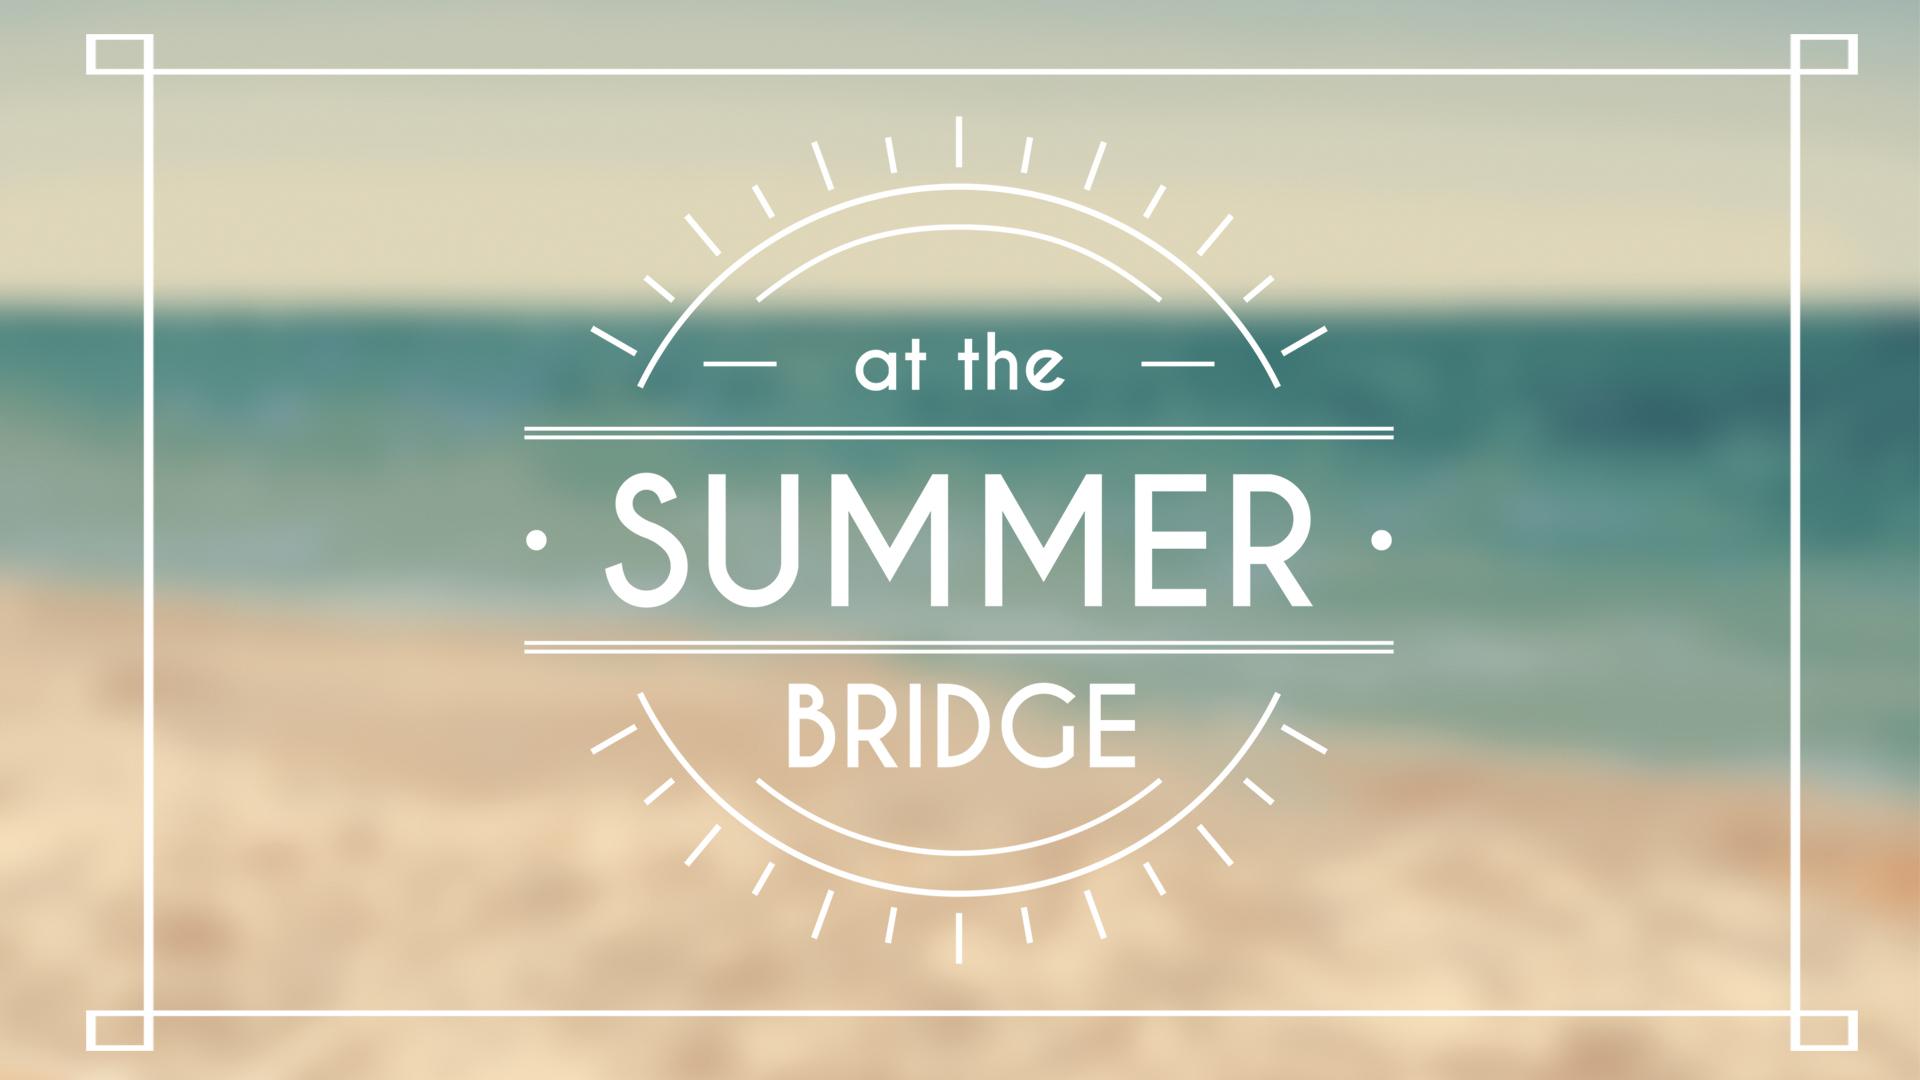 Summer at the Bridge .jpg